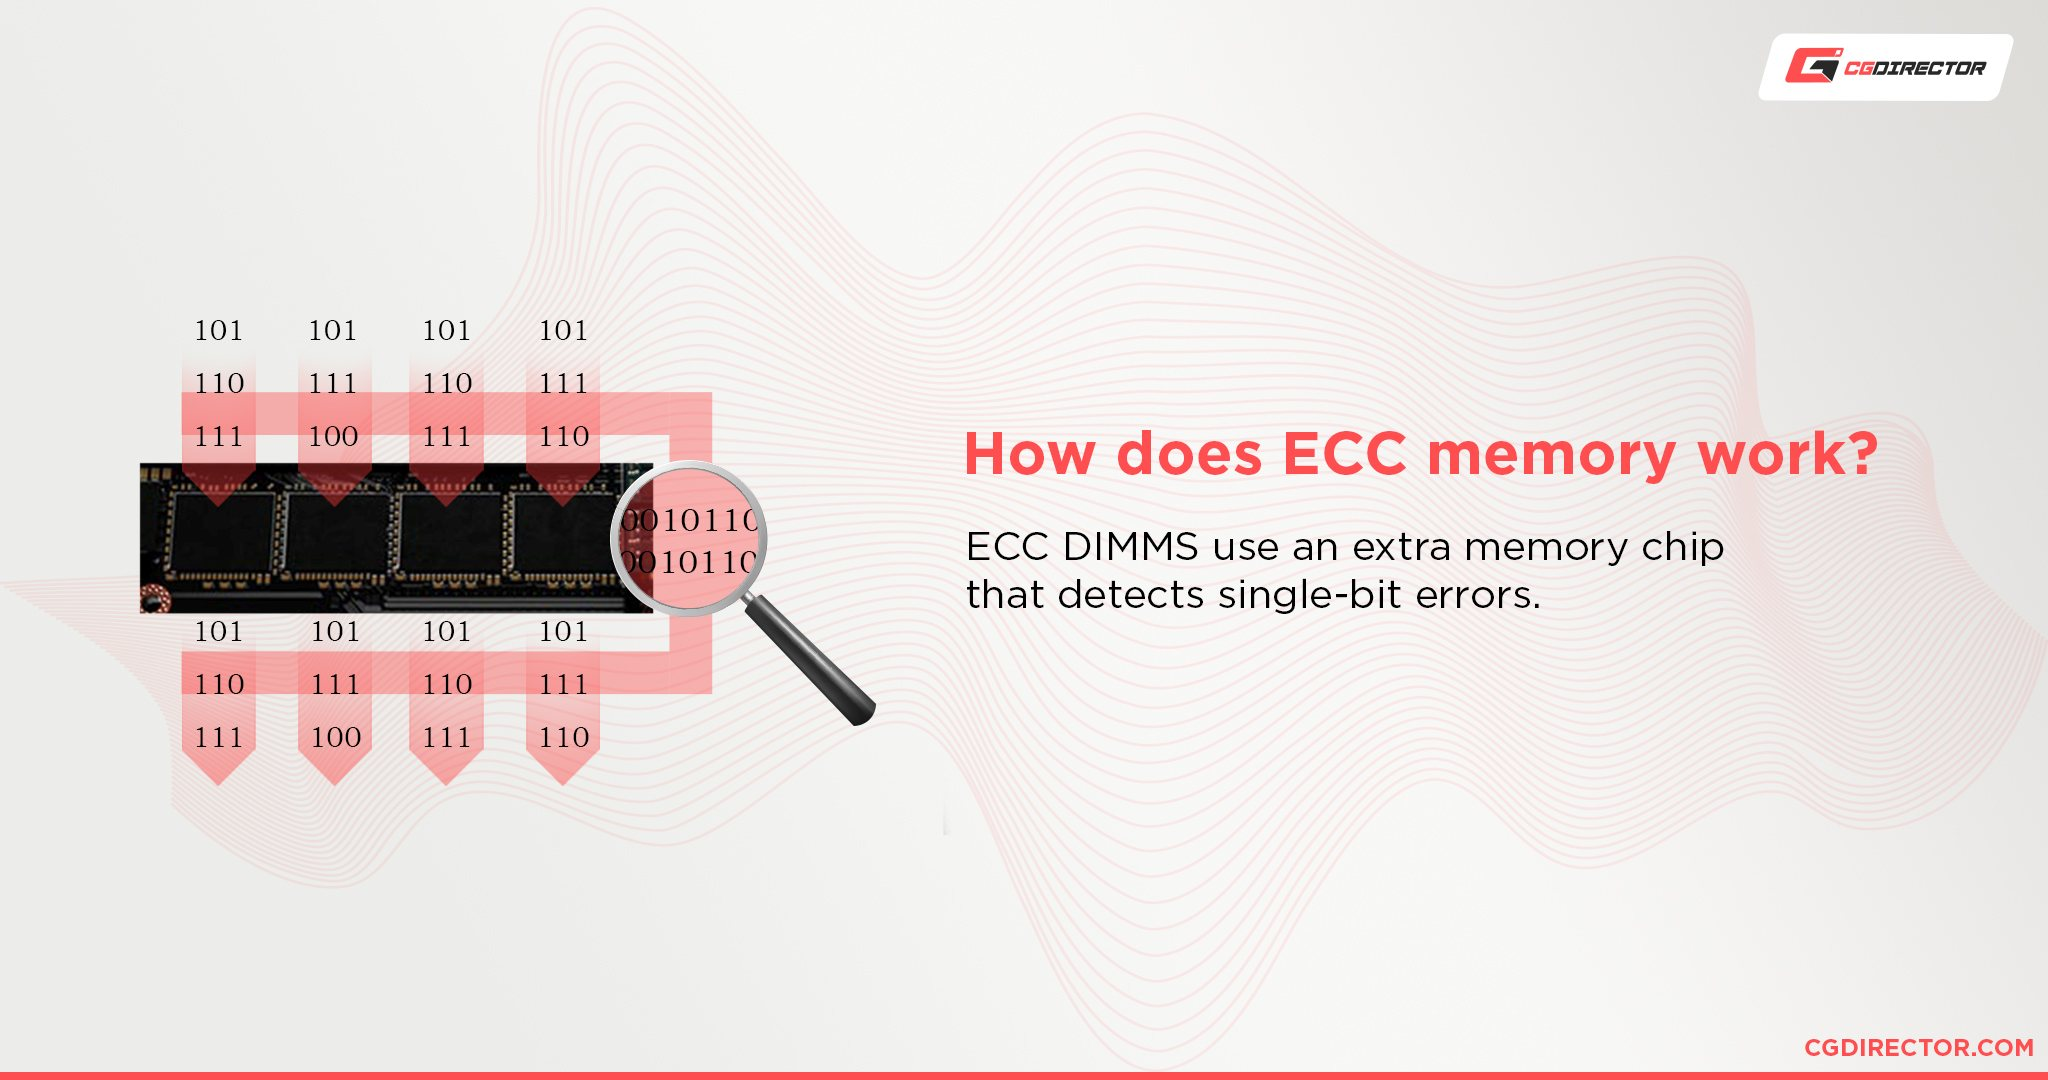 How does ECC memory work